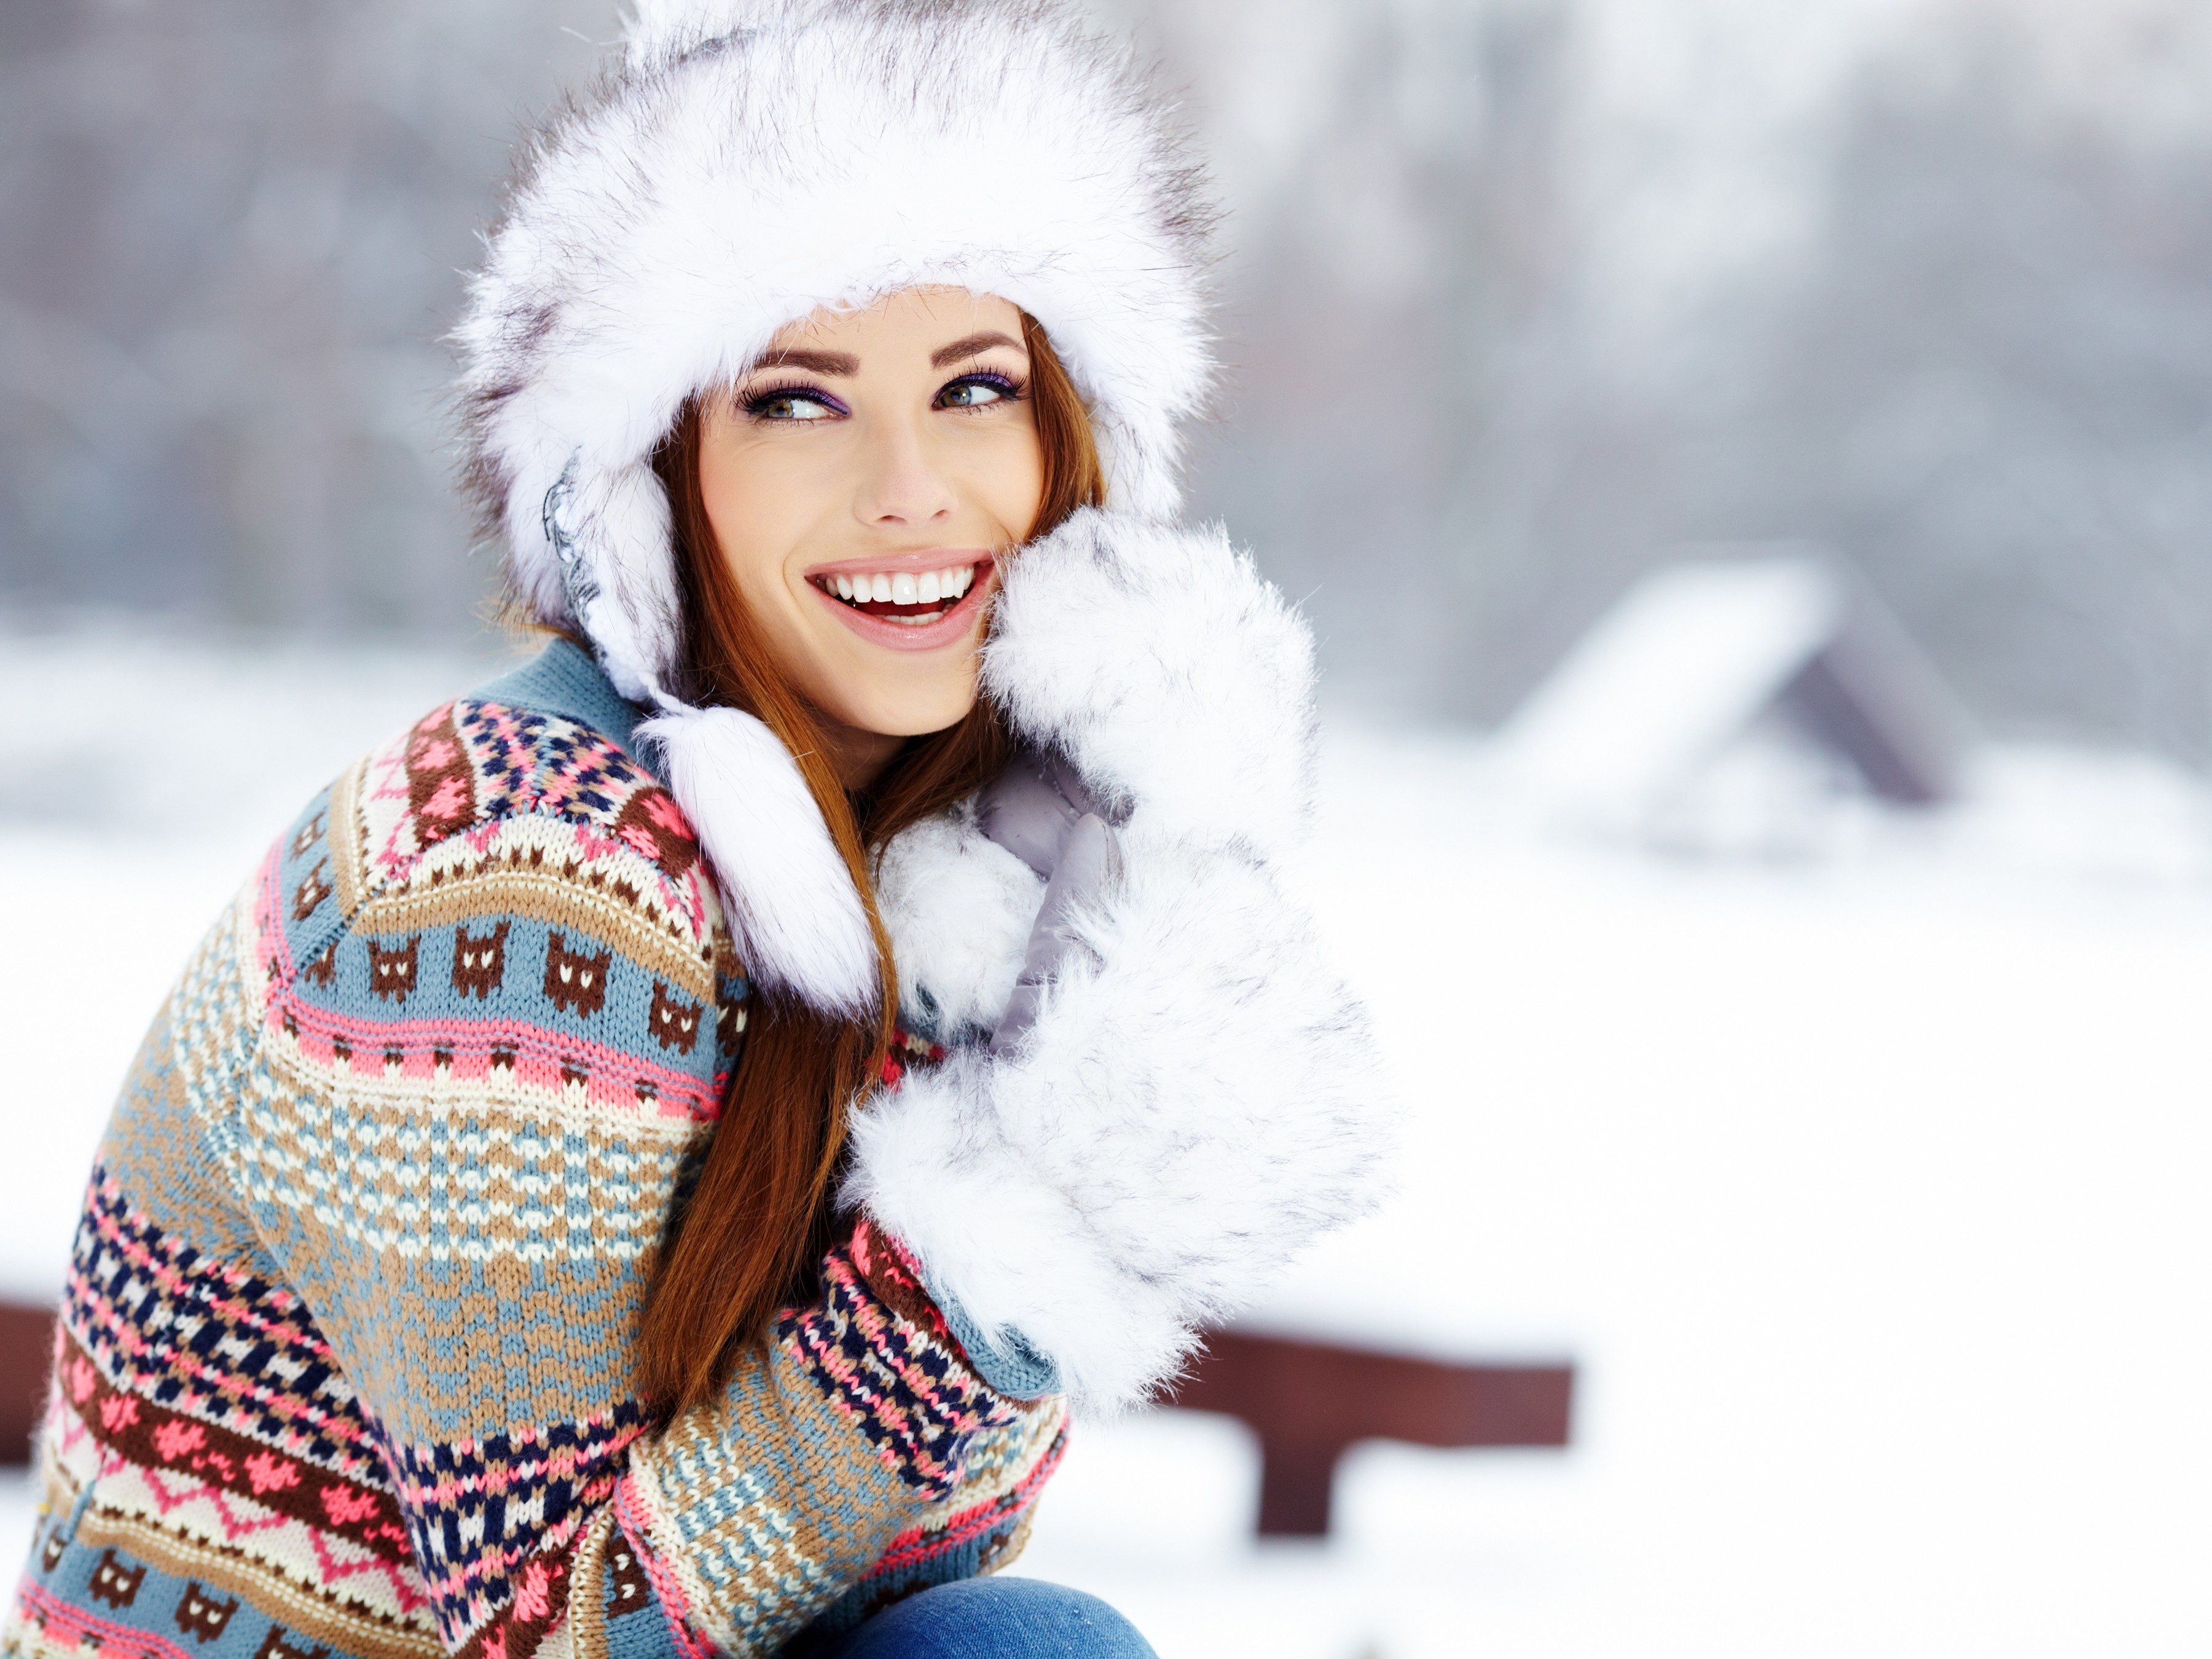 5. Adjust Your Moisturizer for the Season